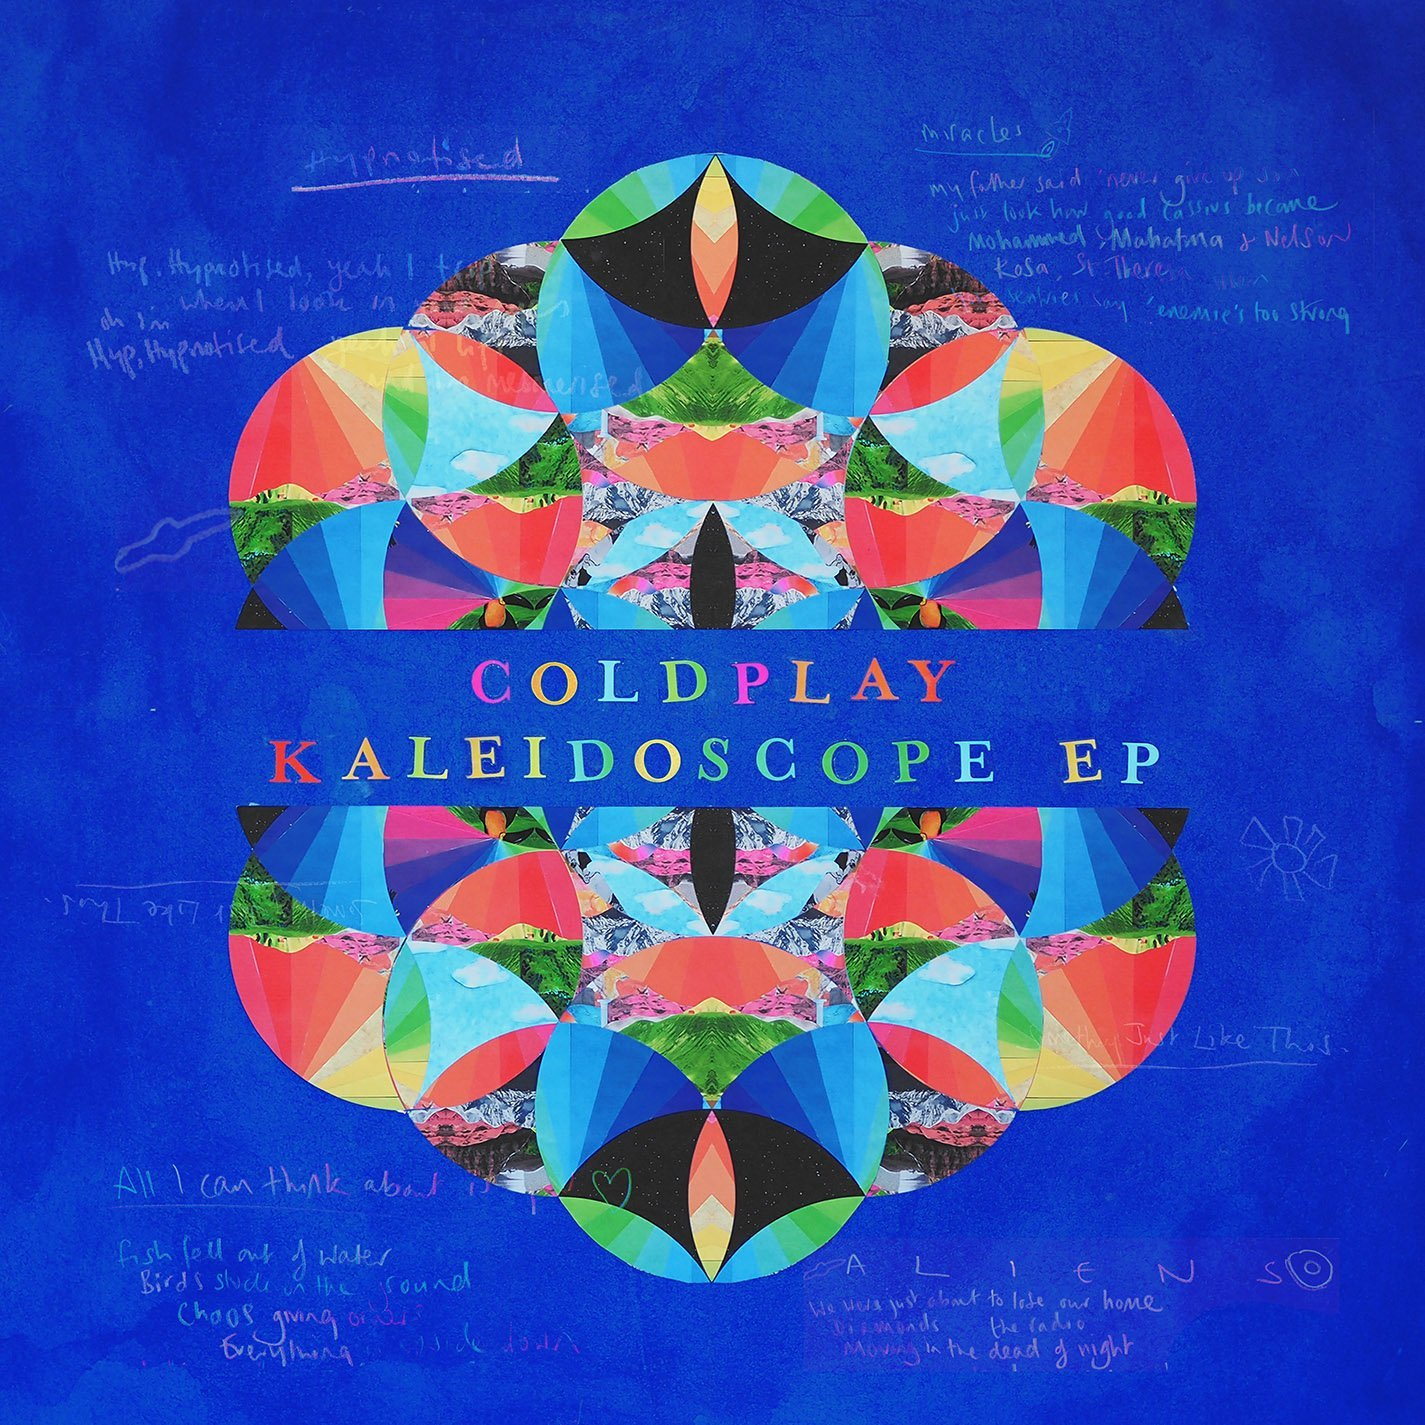 Coldplay, Kaleidoscope EP | Album Review